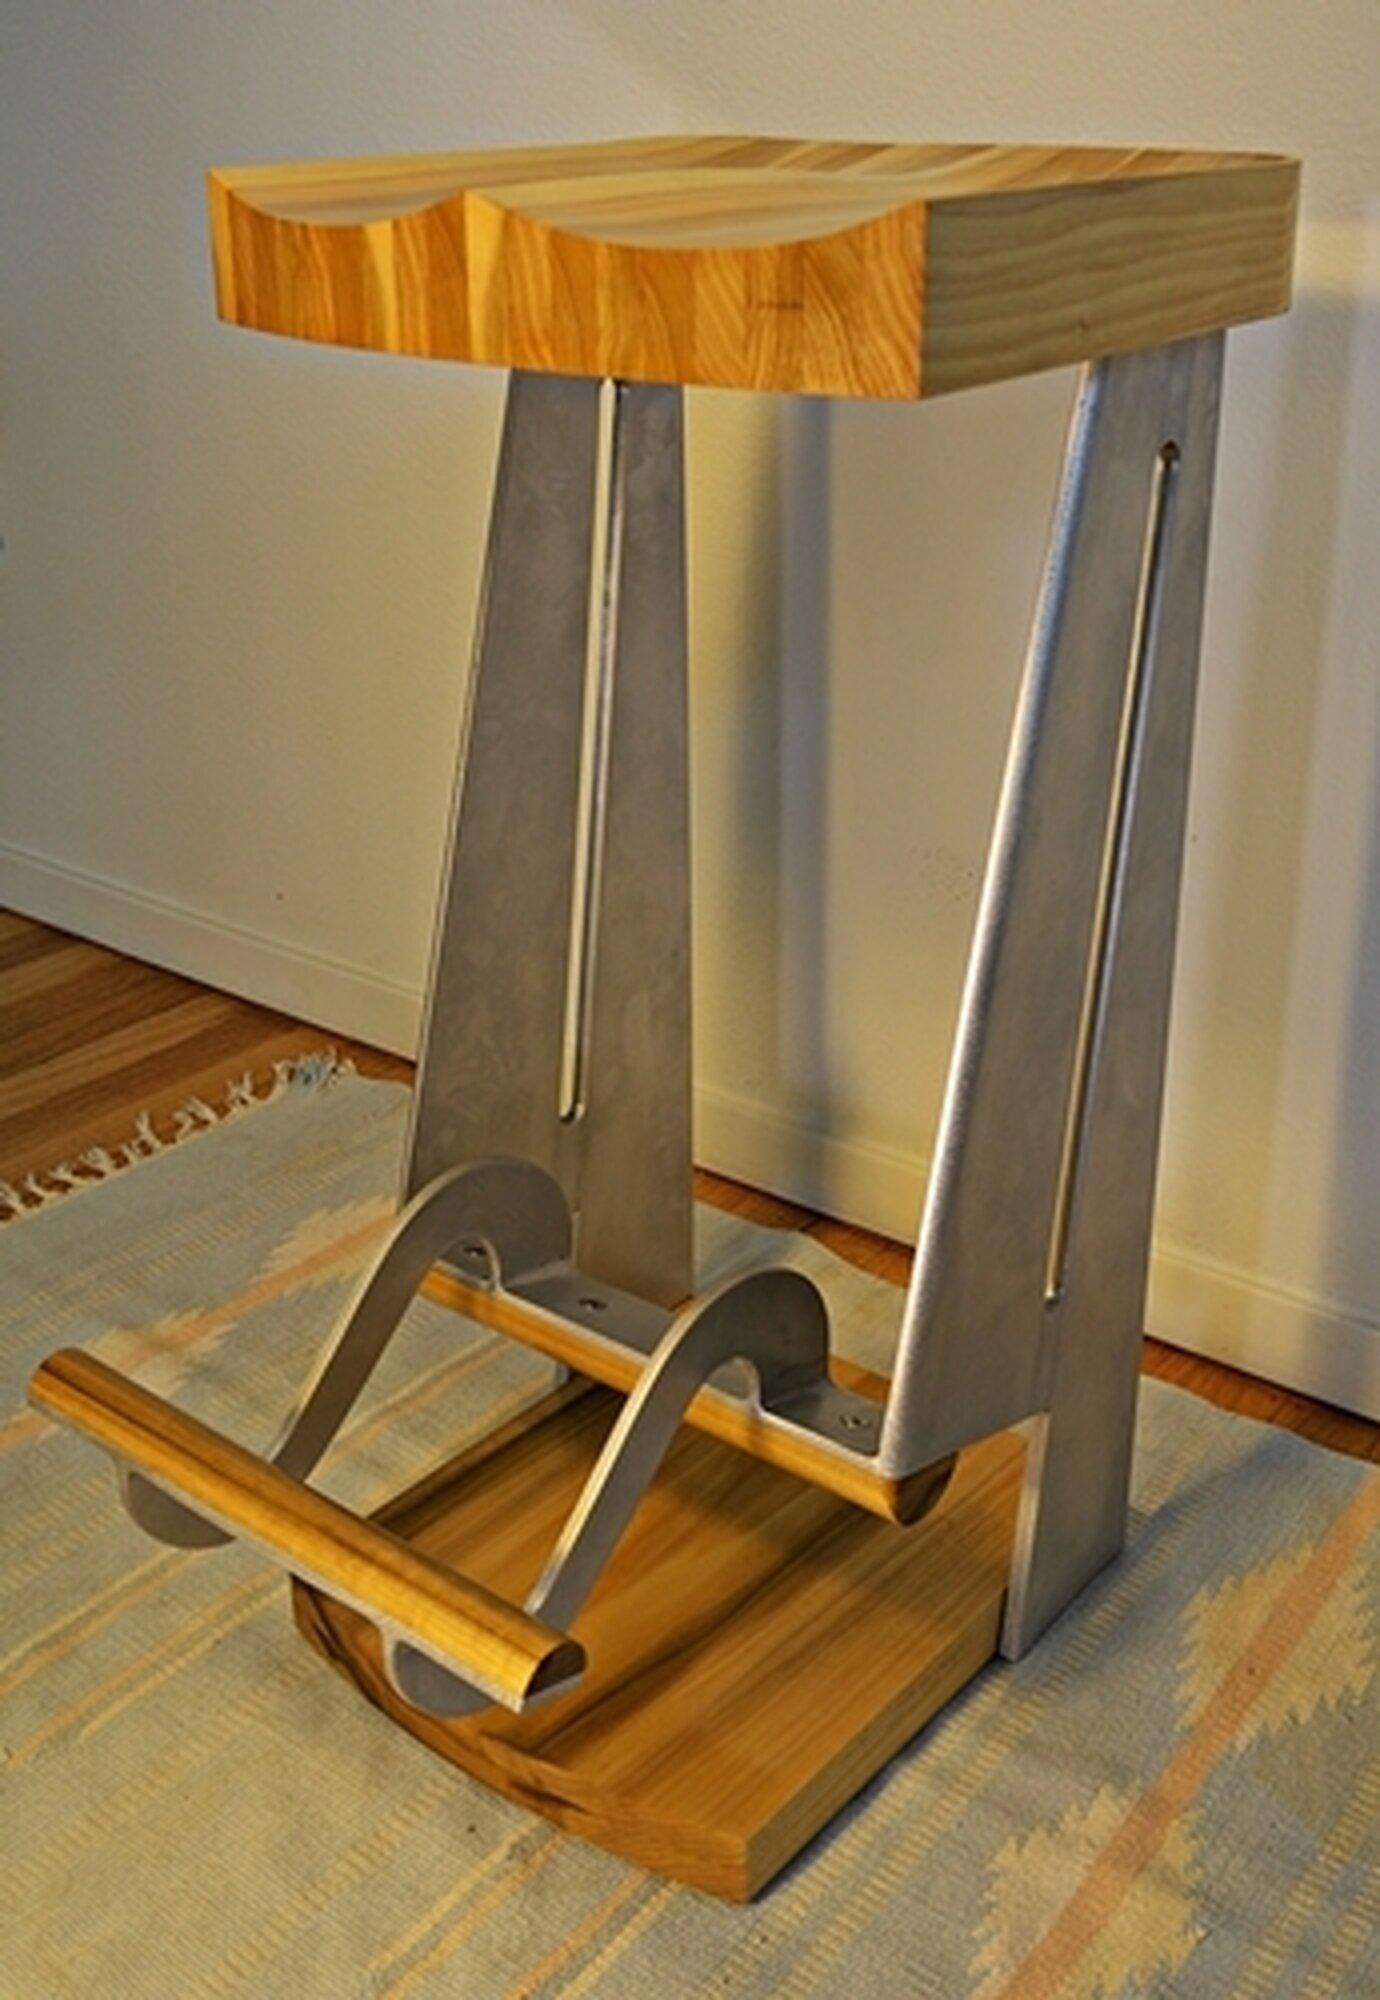 Zeta stools